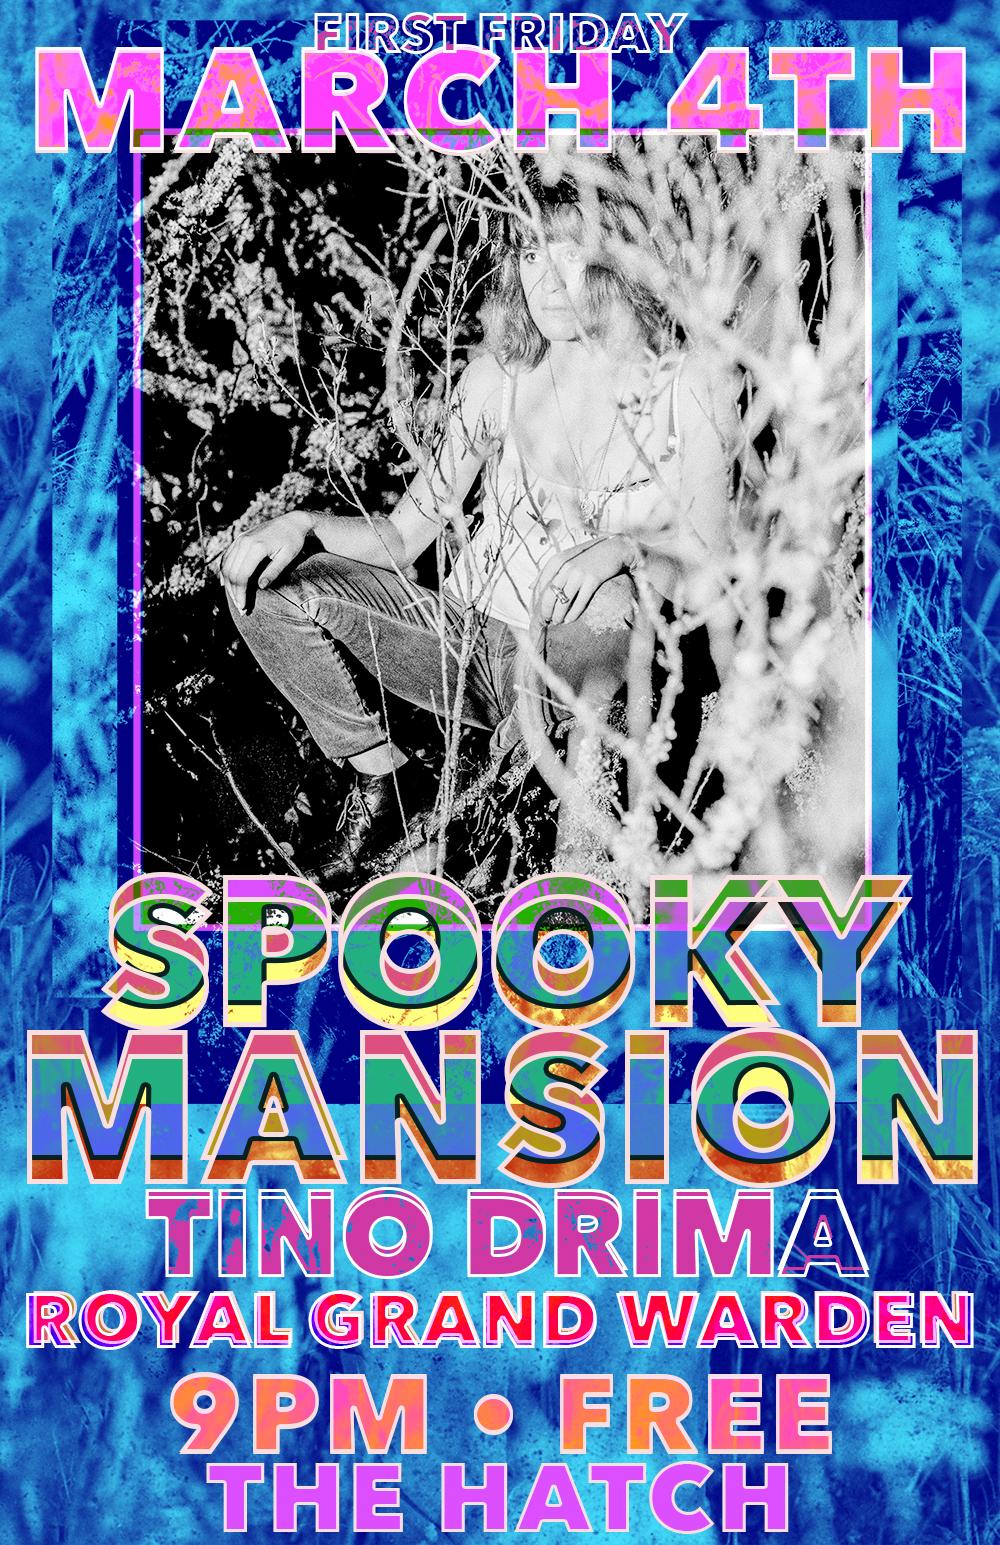 2016.03.04_SpookyMansion-RGW_V2-web.jpg